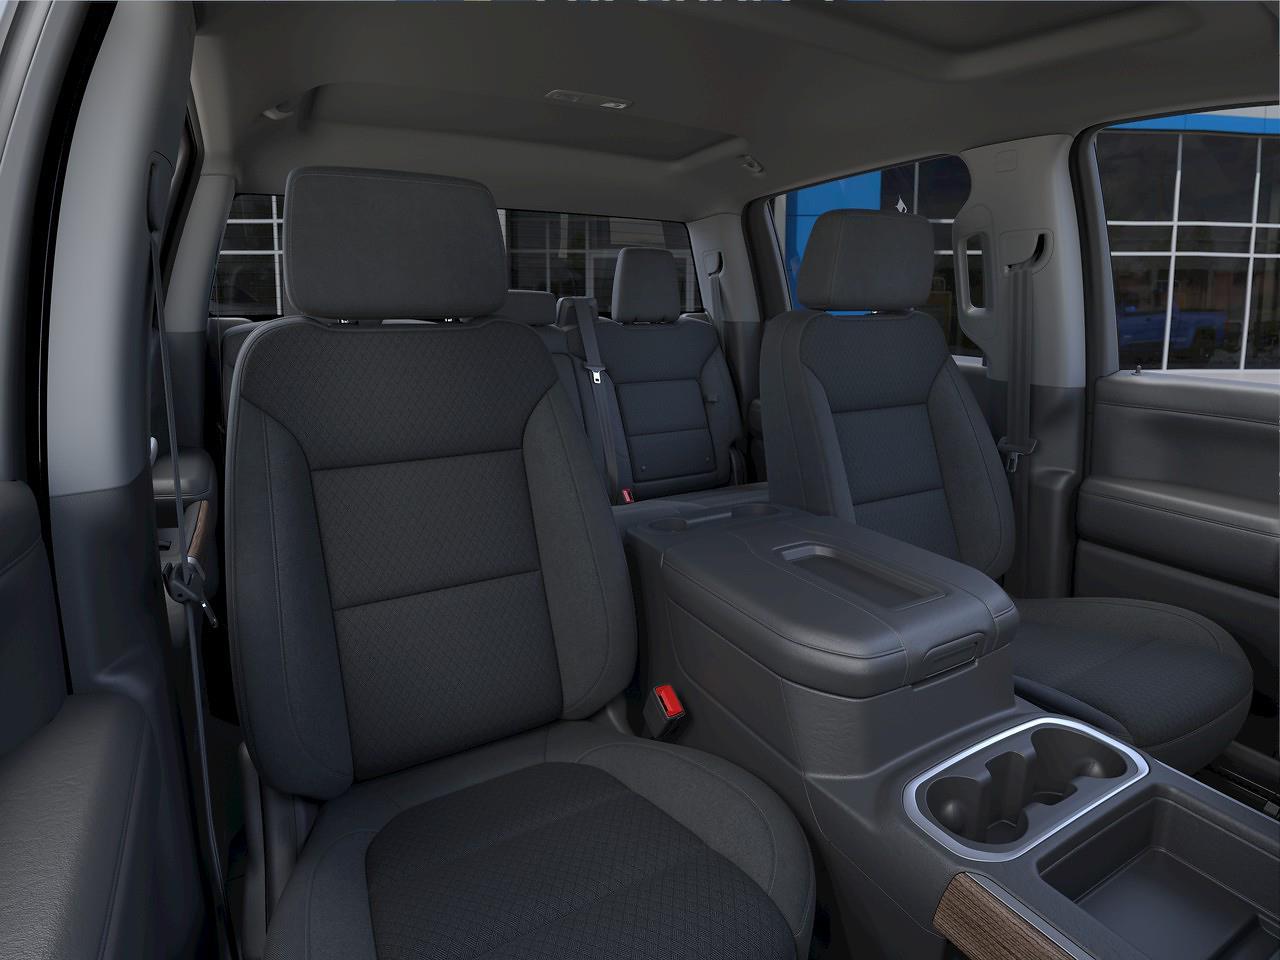 2021 Chevrolet Silverado 1500 Crew Cab 4x4, Pickup #Q210399 - photo 33